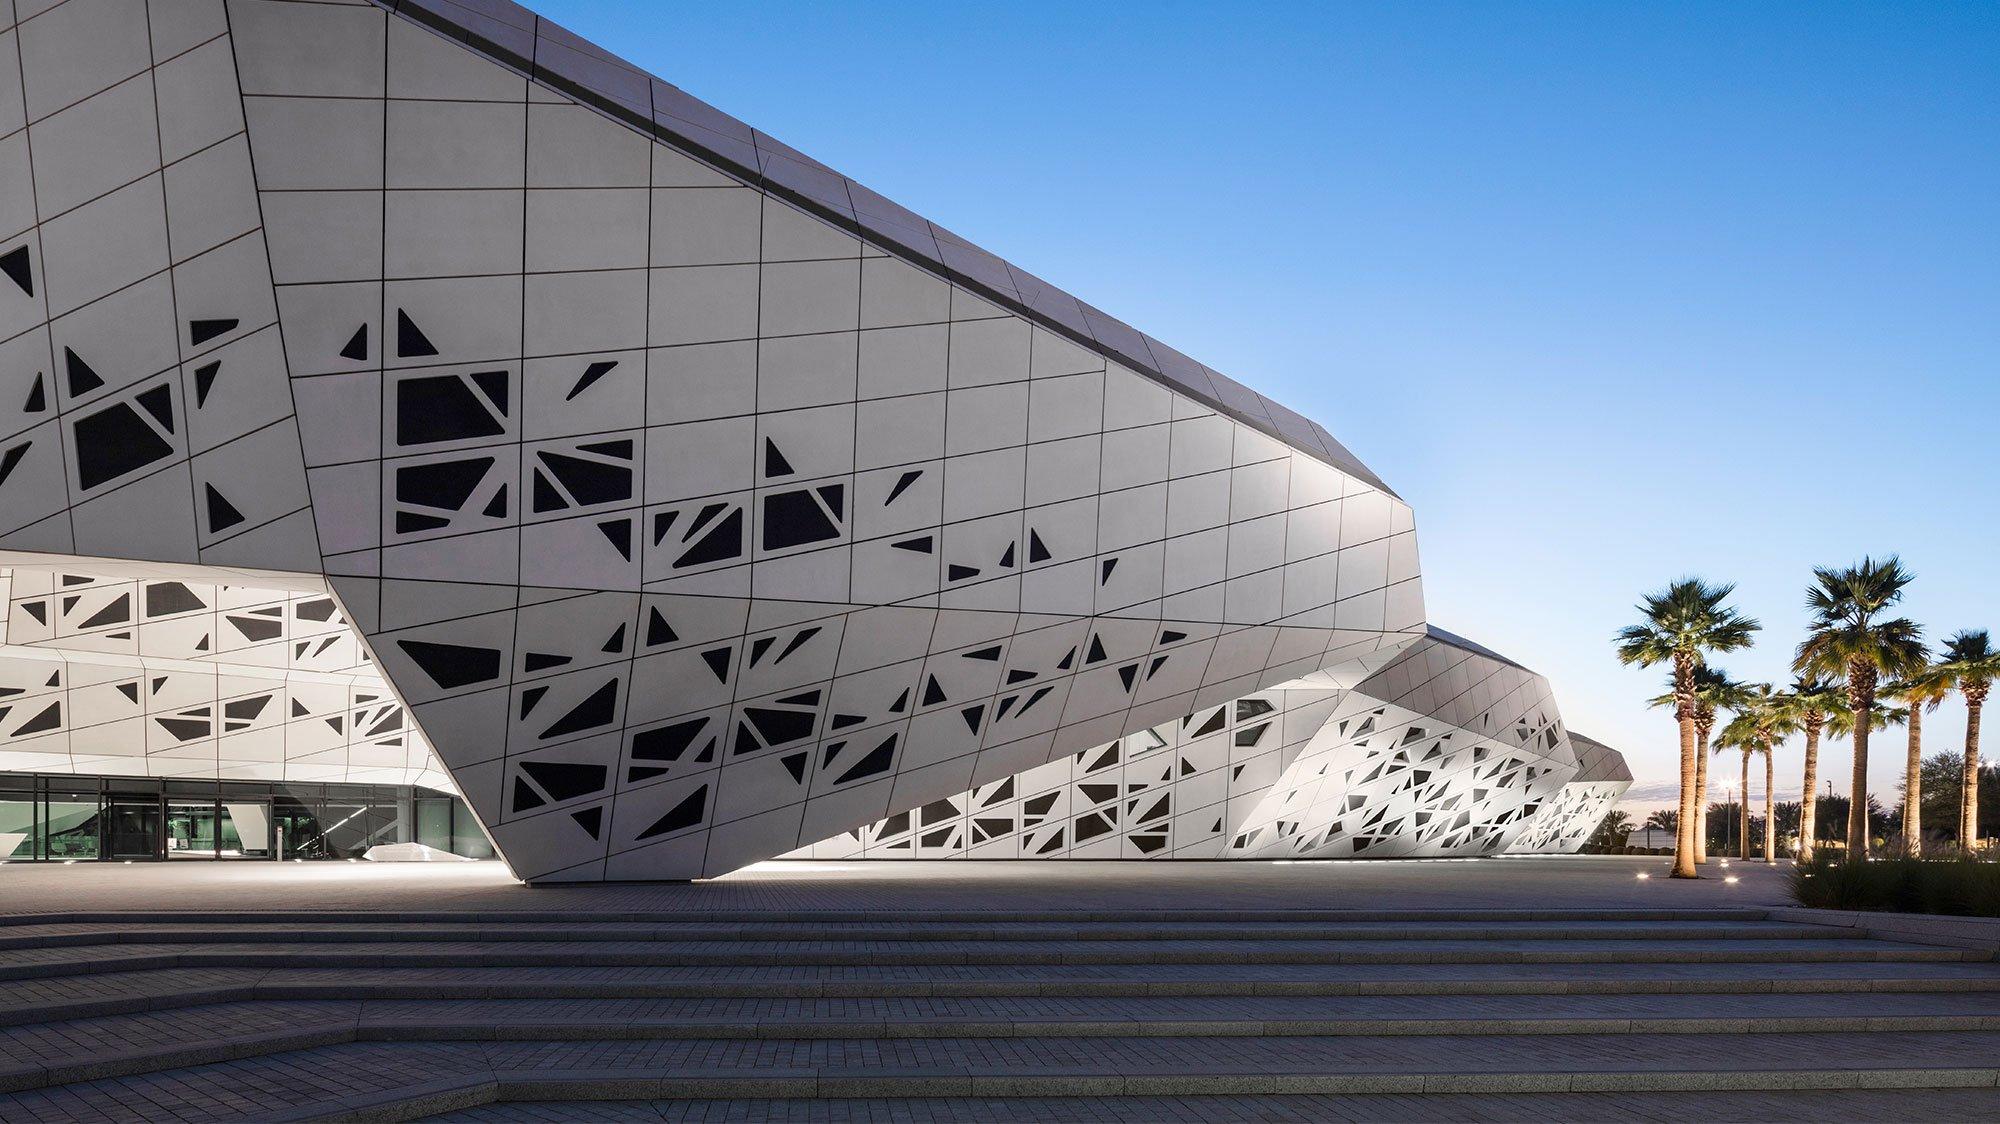 KAPSARC Saudi Arabia exterior architectural lighting design OVI Chinese